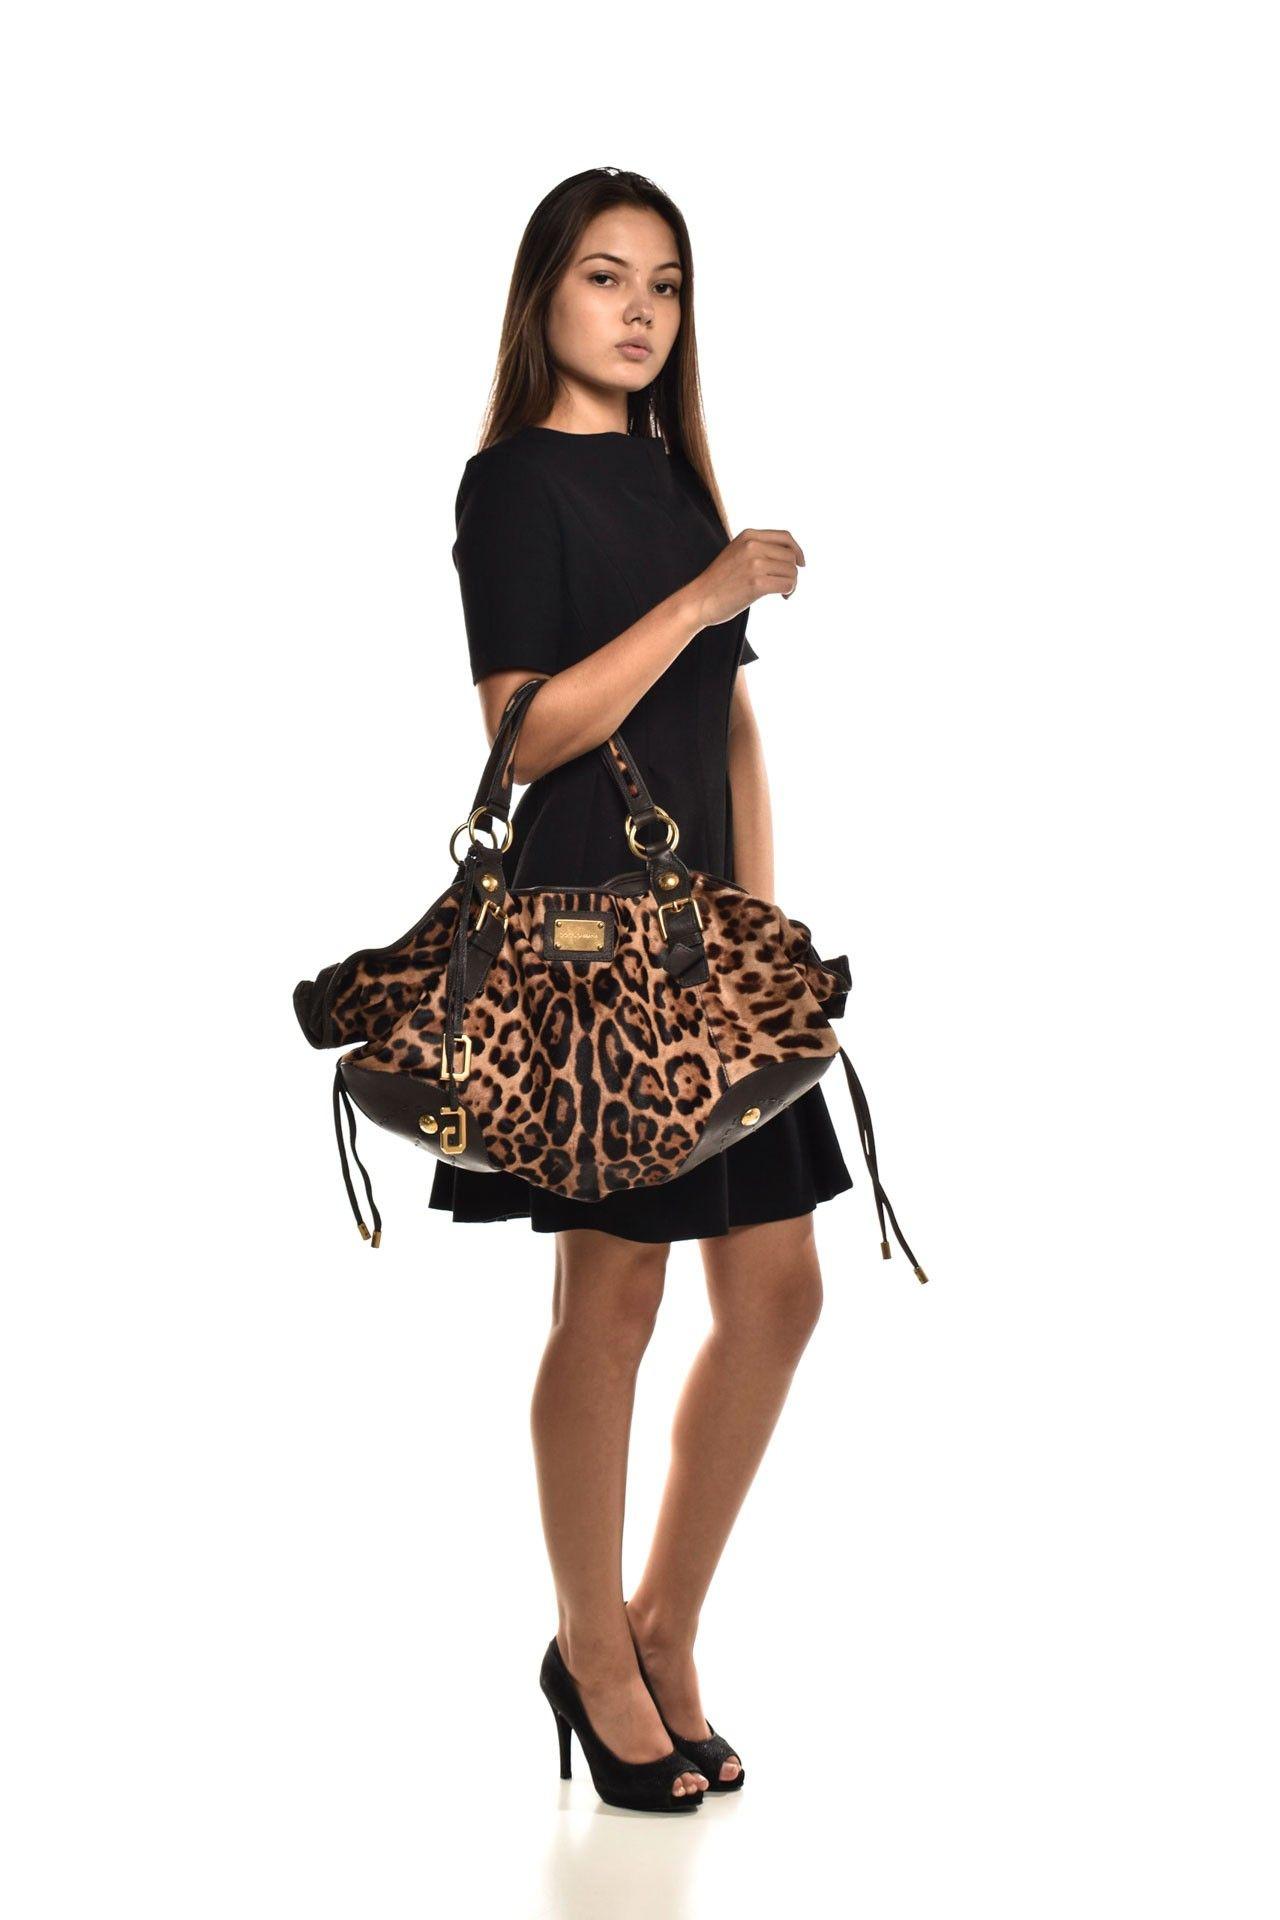 Dolce & Gabbana - Bolsa Estampa Onça - Foto 8